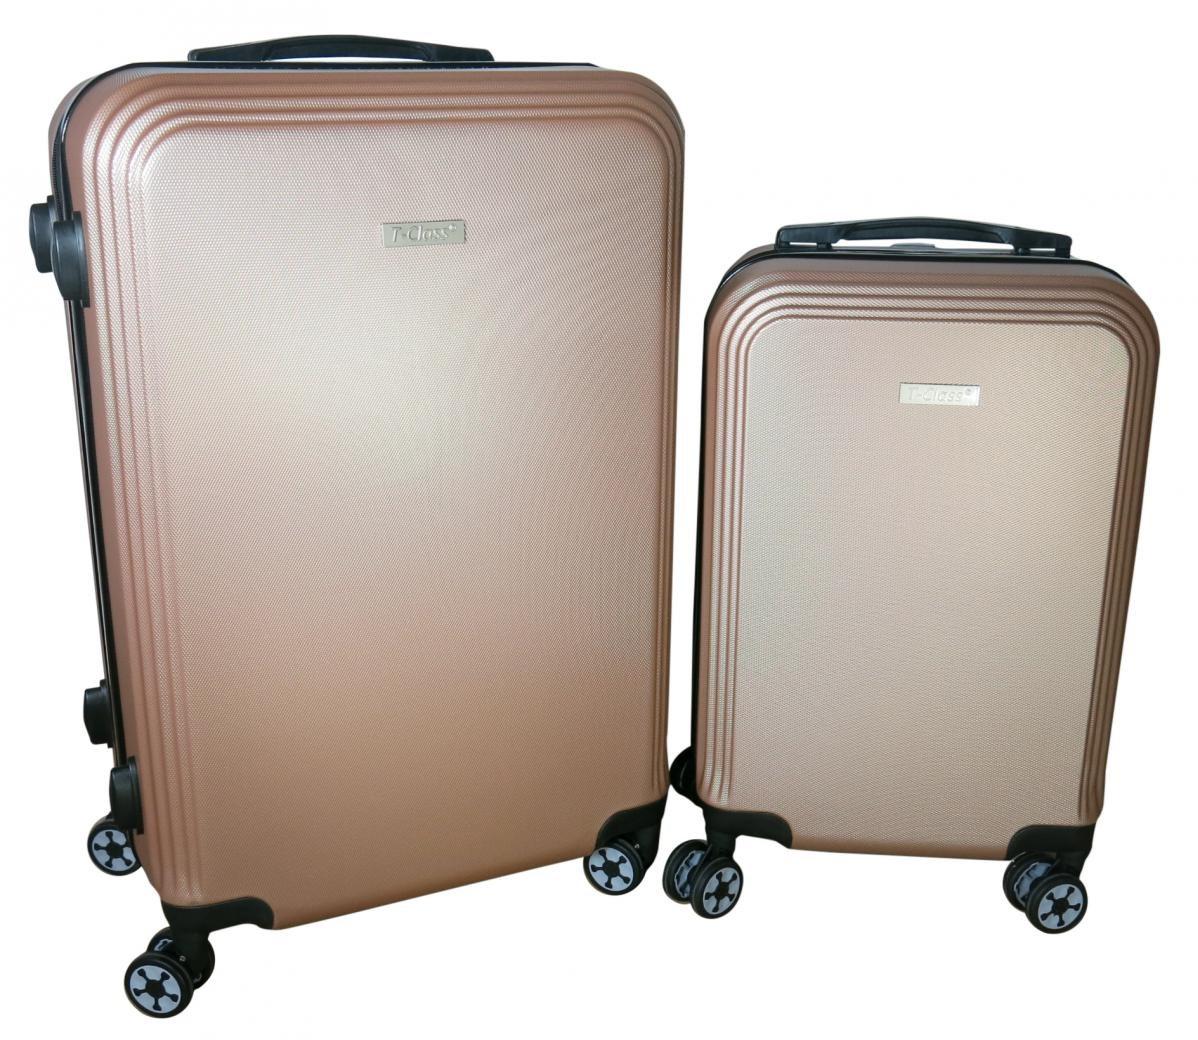 Sada 2 kufrů T-Class 1360 champagne , ABS plast, TSA zámek